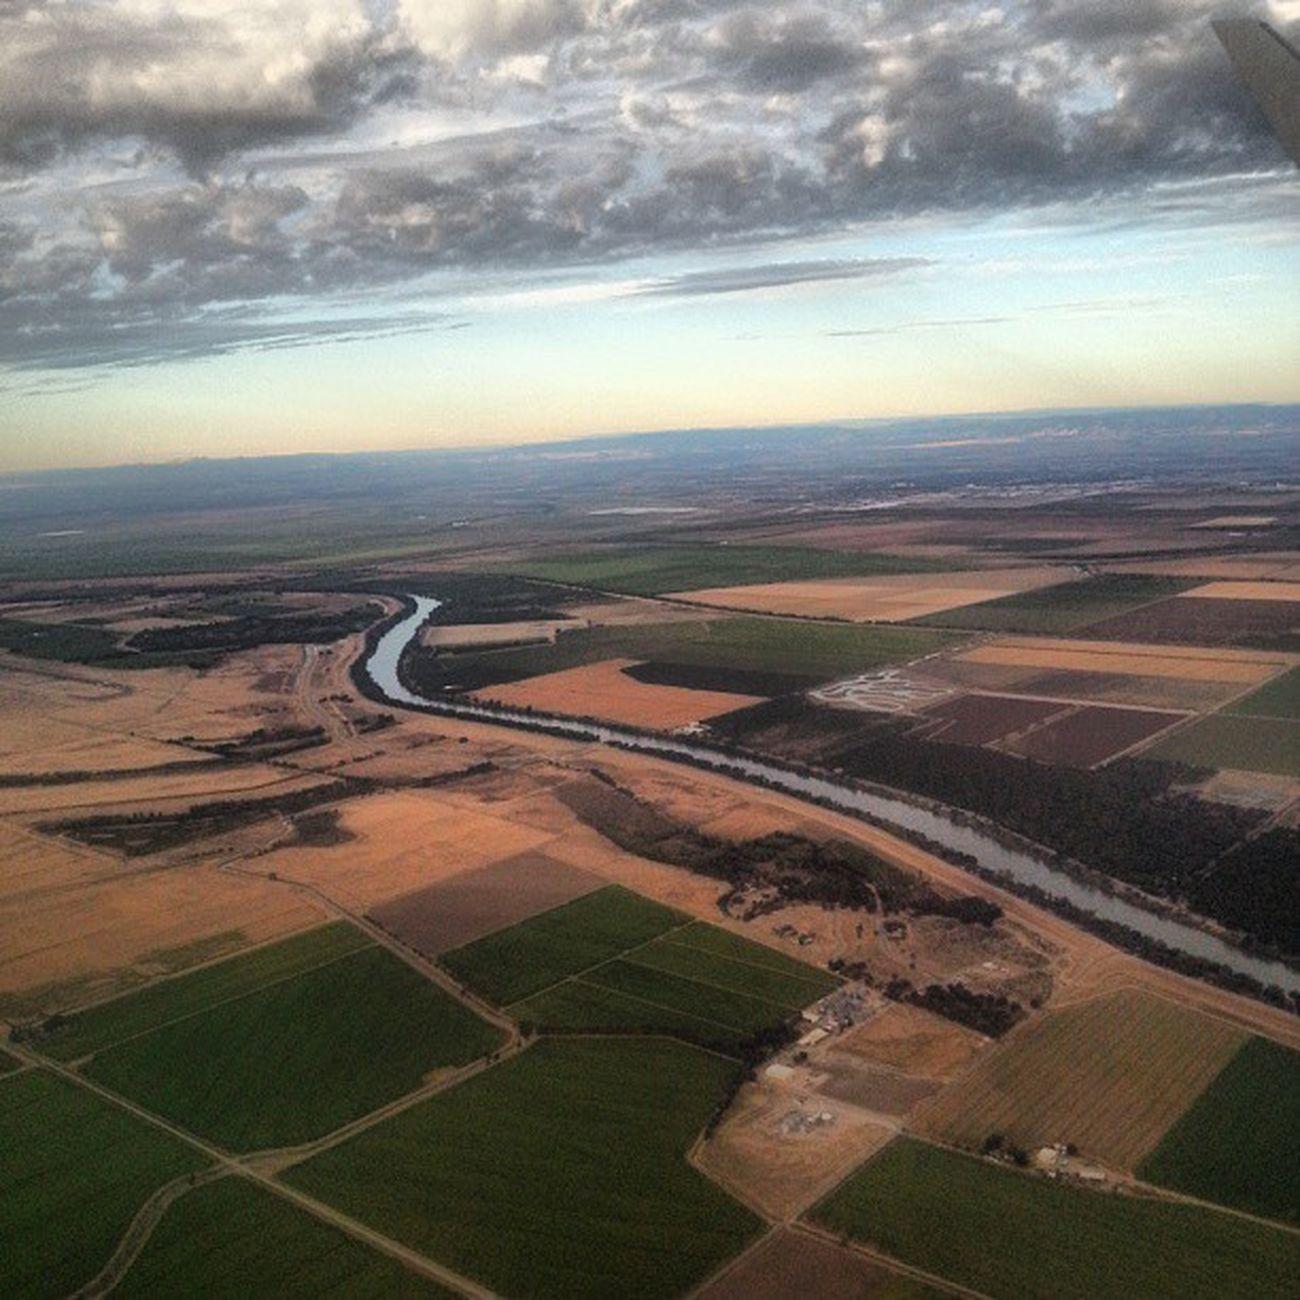 Sacramento Sacramentoairport Sactown Arialview airplanes clouds rivers farmland peaceout